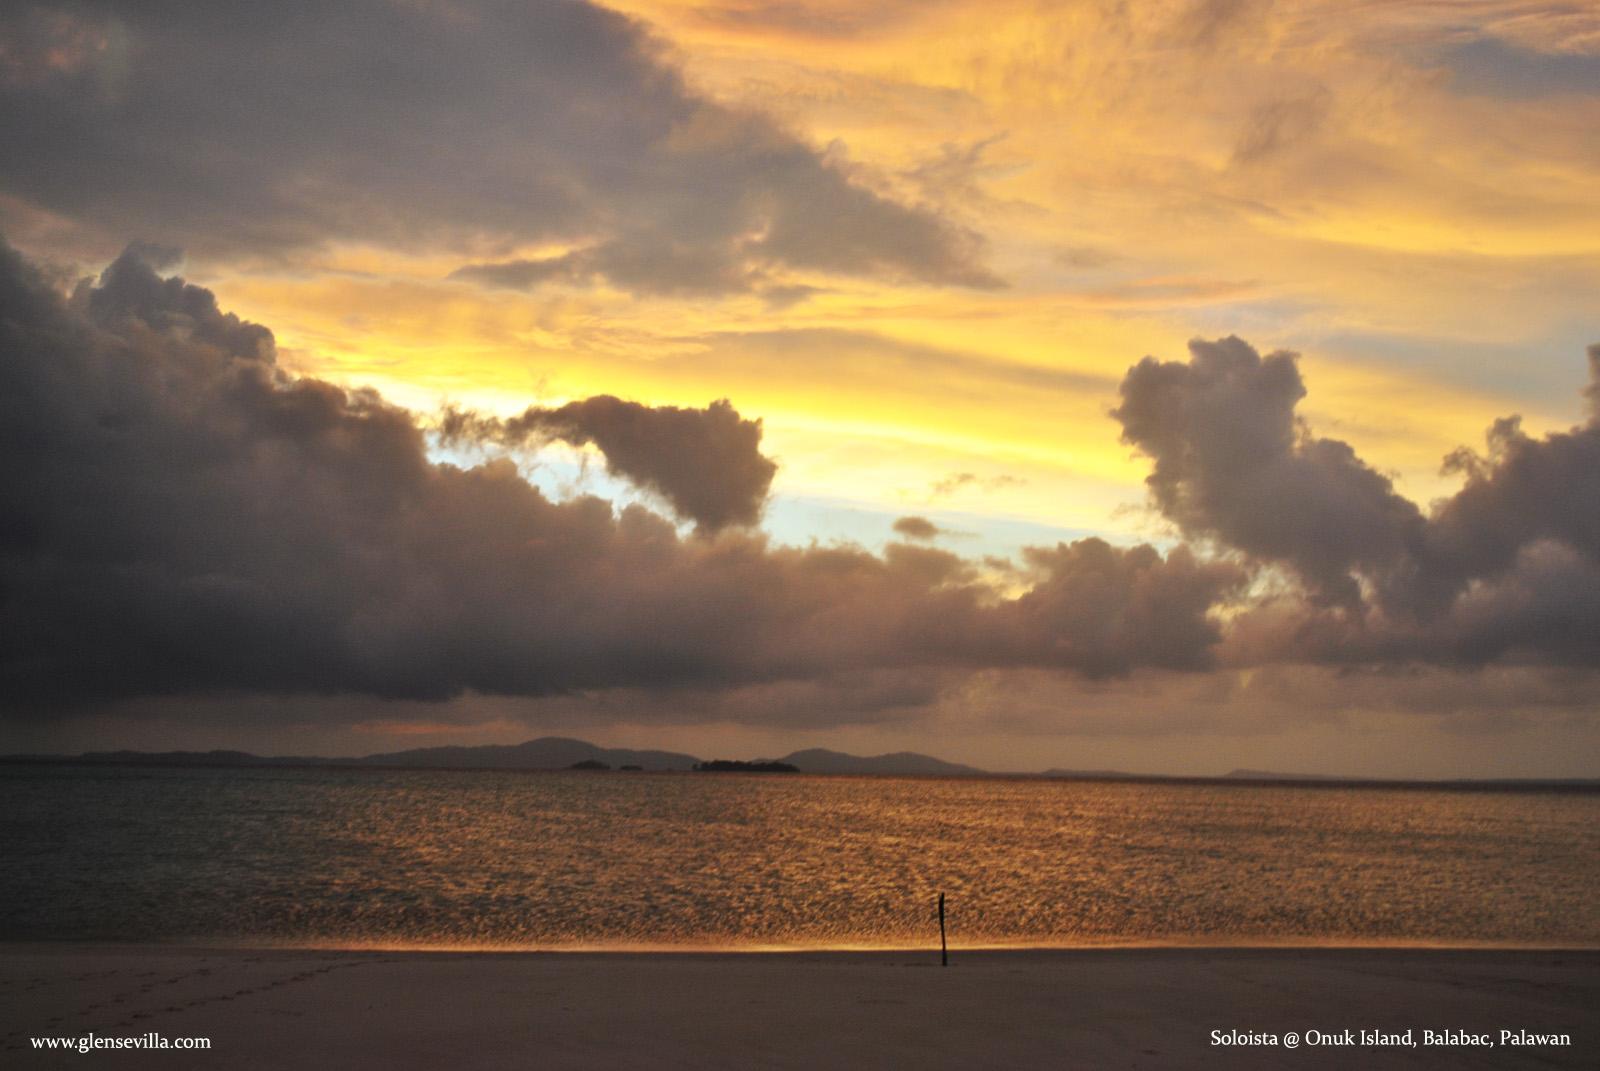 Onok Onuk Island Balabac Palawan